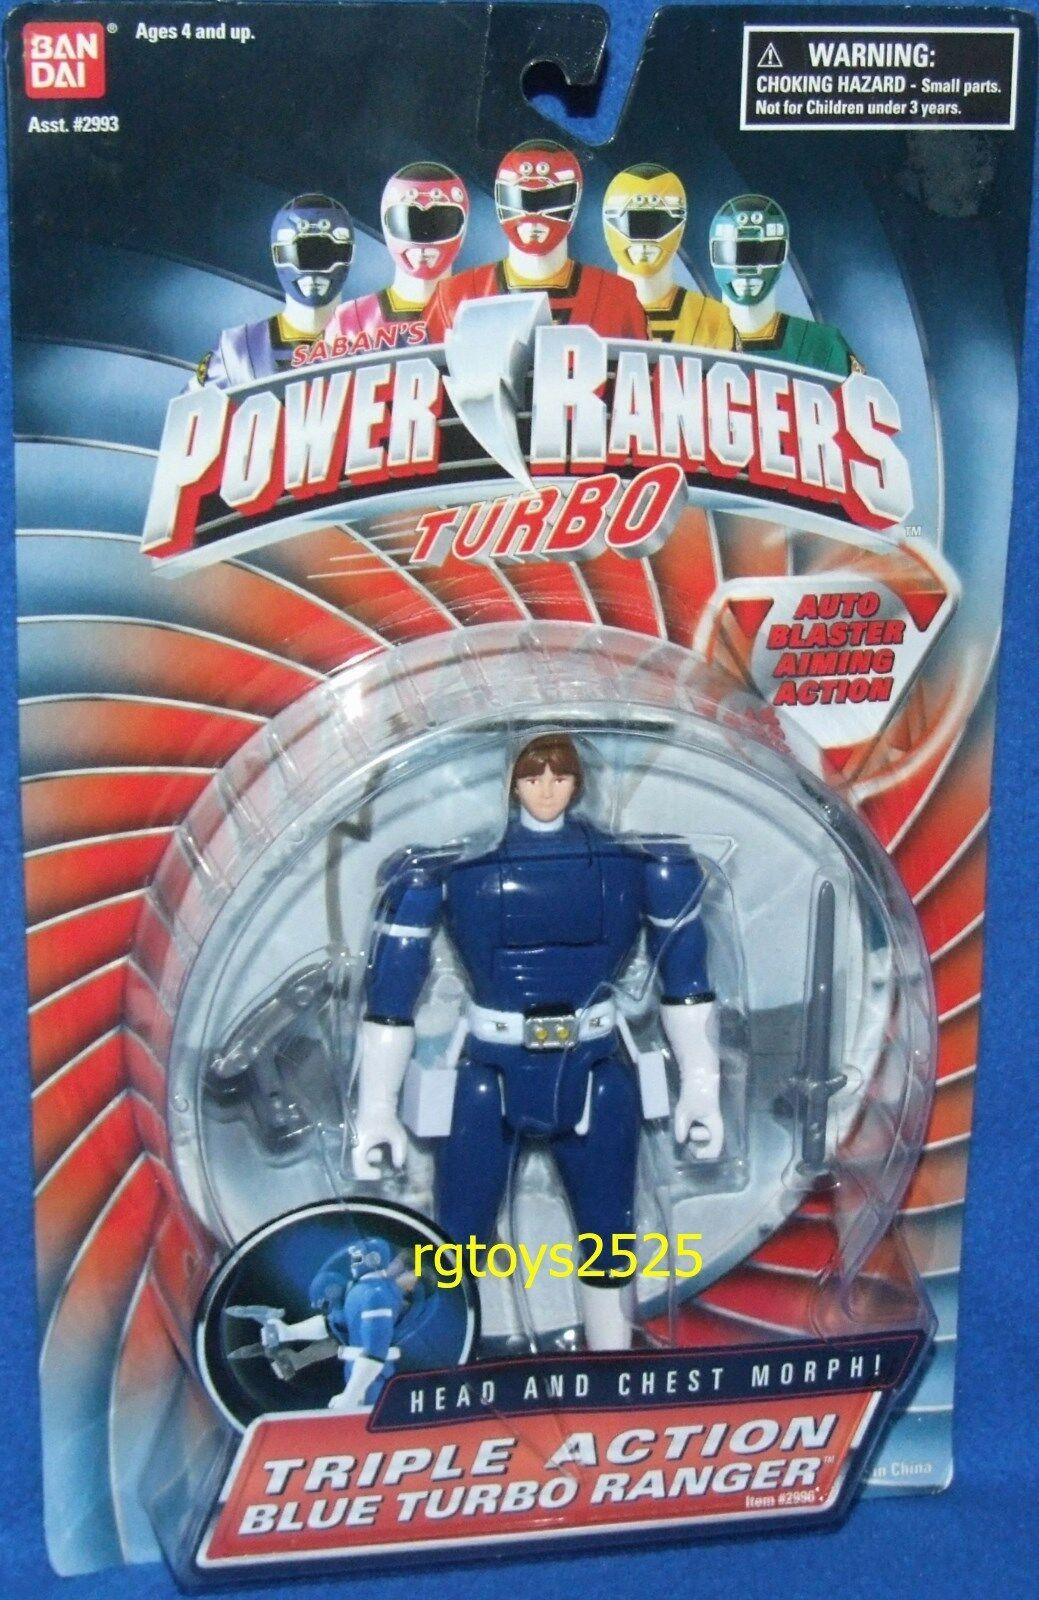 Power Rangers Turbo Triple Action Blau Turbo Ranger New Factory Sealed 1997